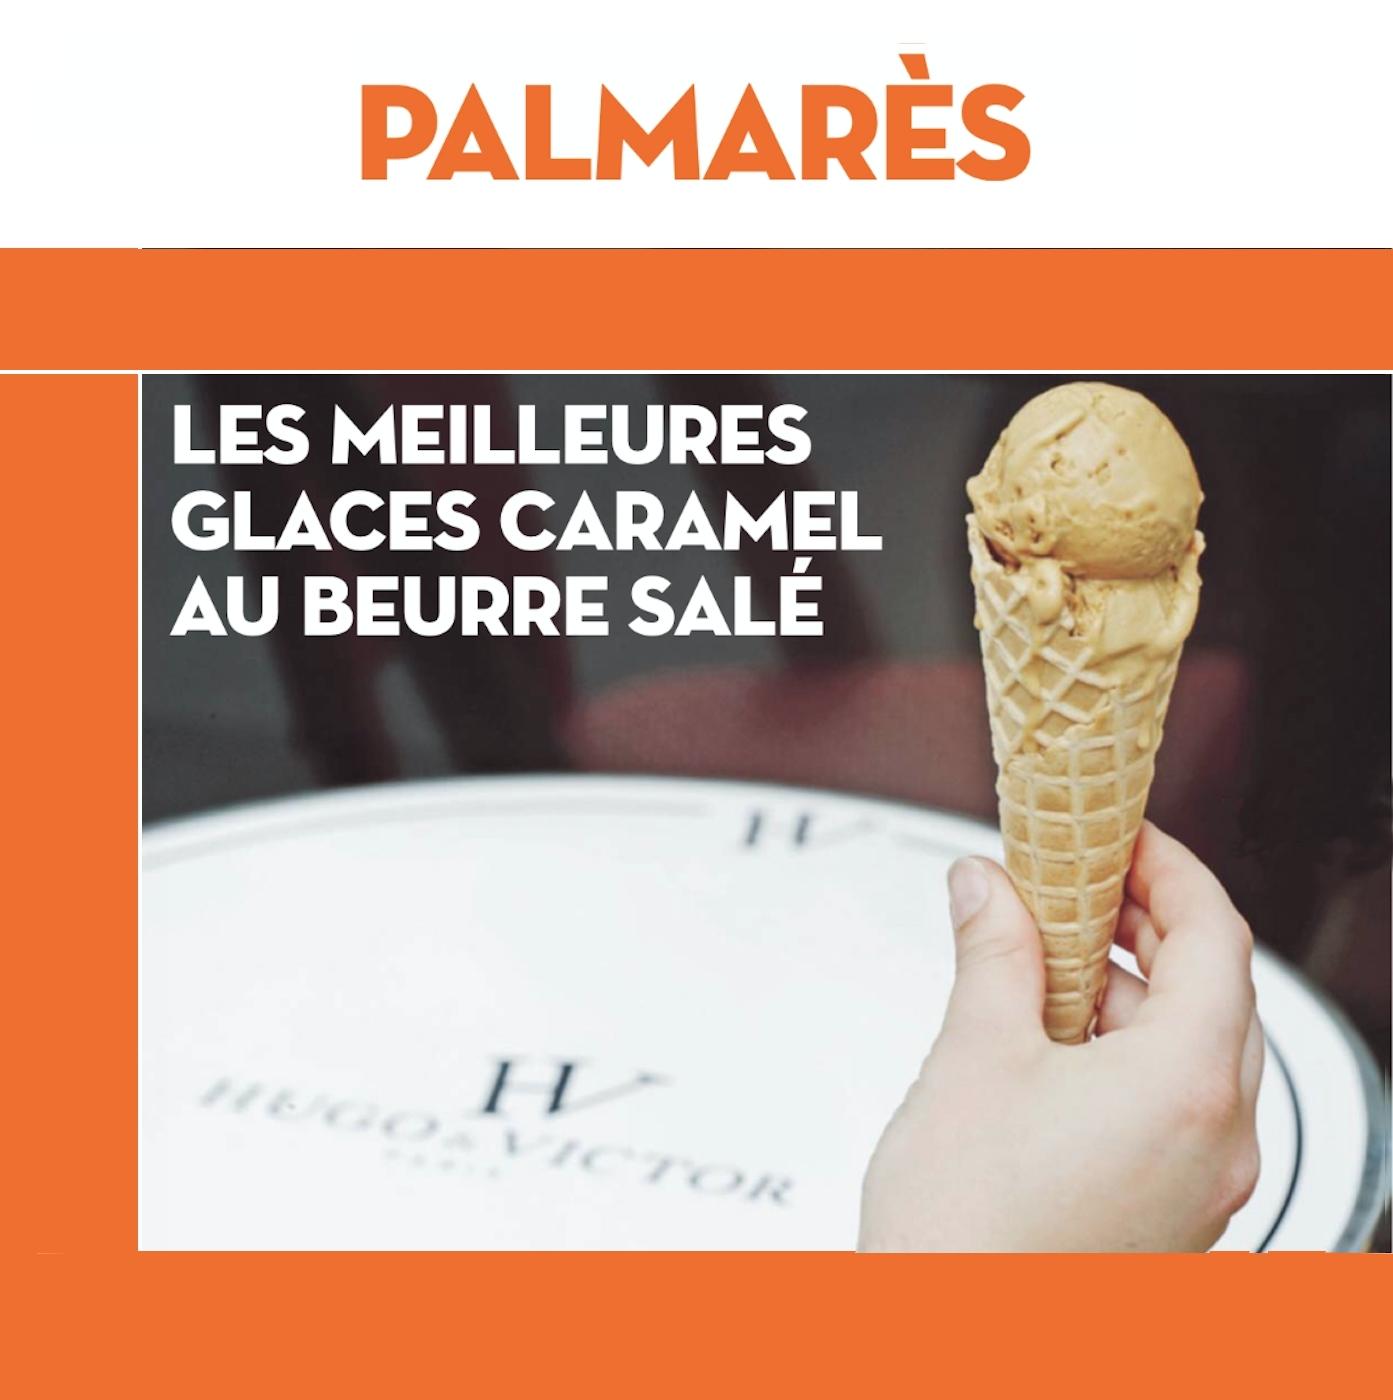 Meilleure Glace Caramel beurre salé de Paris